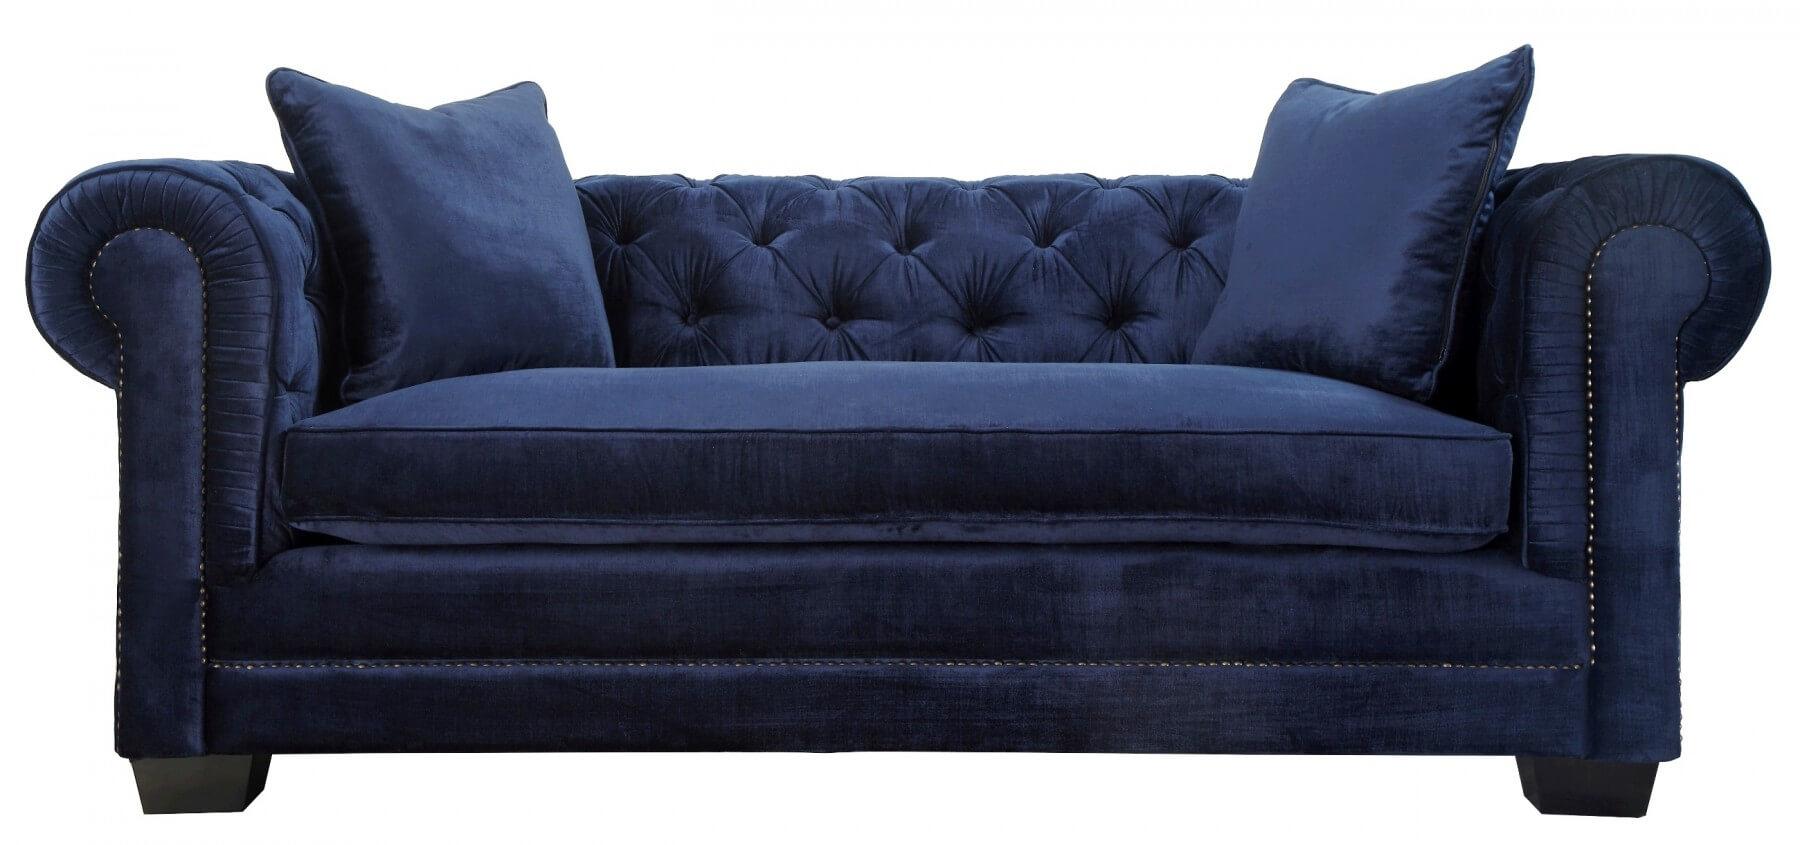 Norwalk sofa linkin sectional by norwalk furniture our for Norwalk furniture sectional sofa